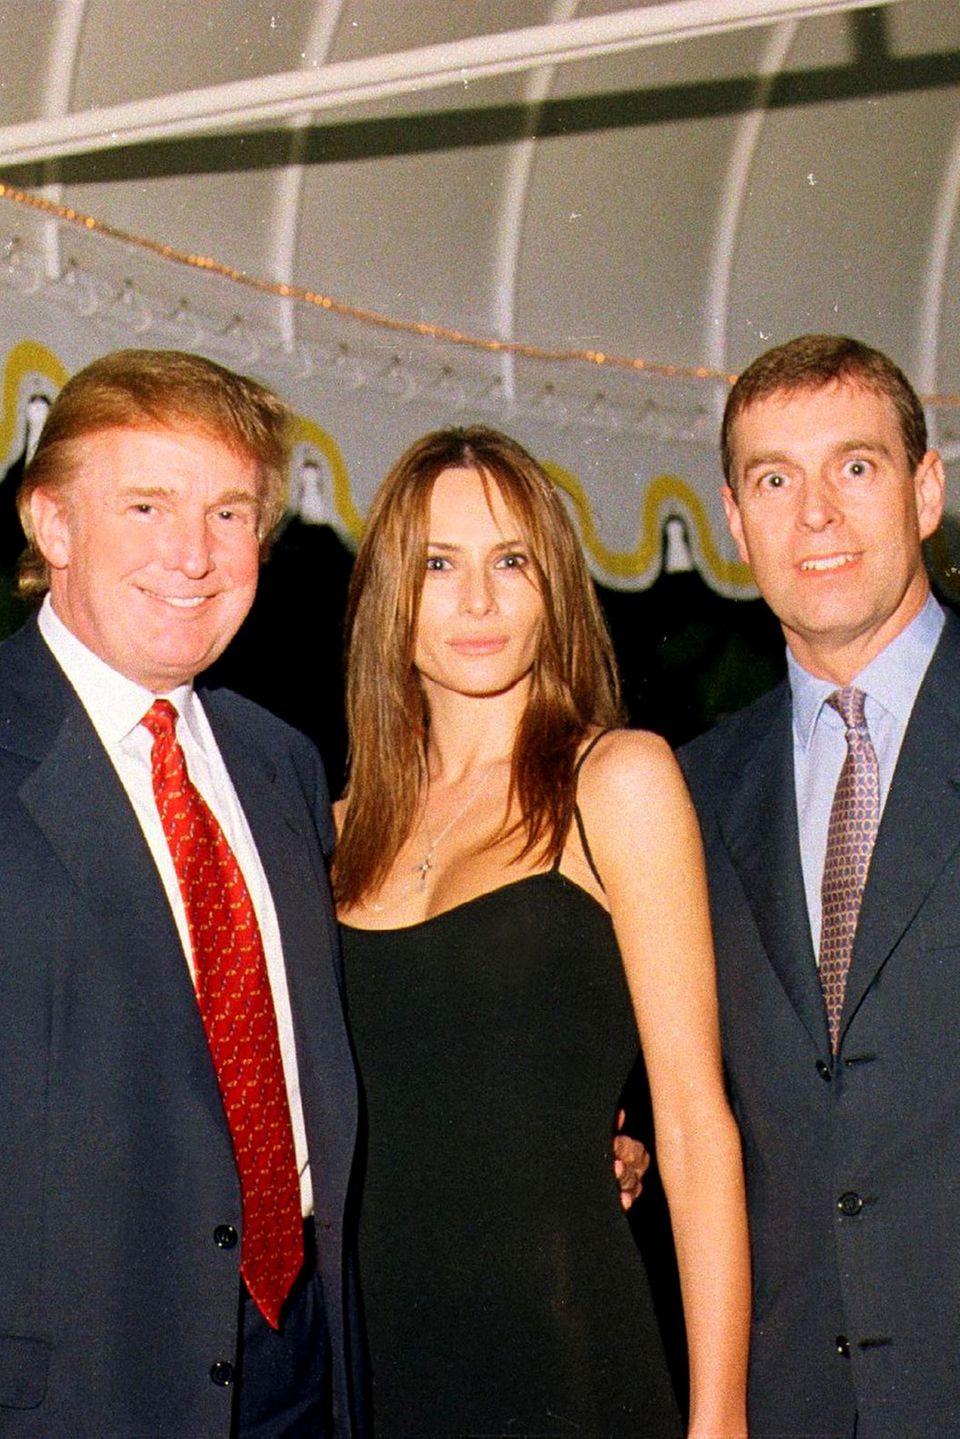 Donald Trump Starportrat News Bilder Gala De